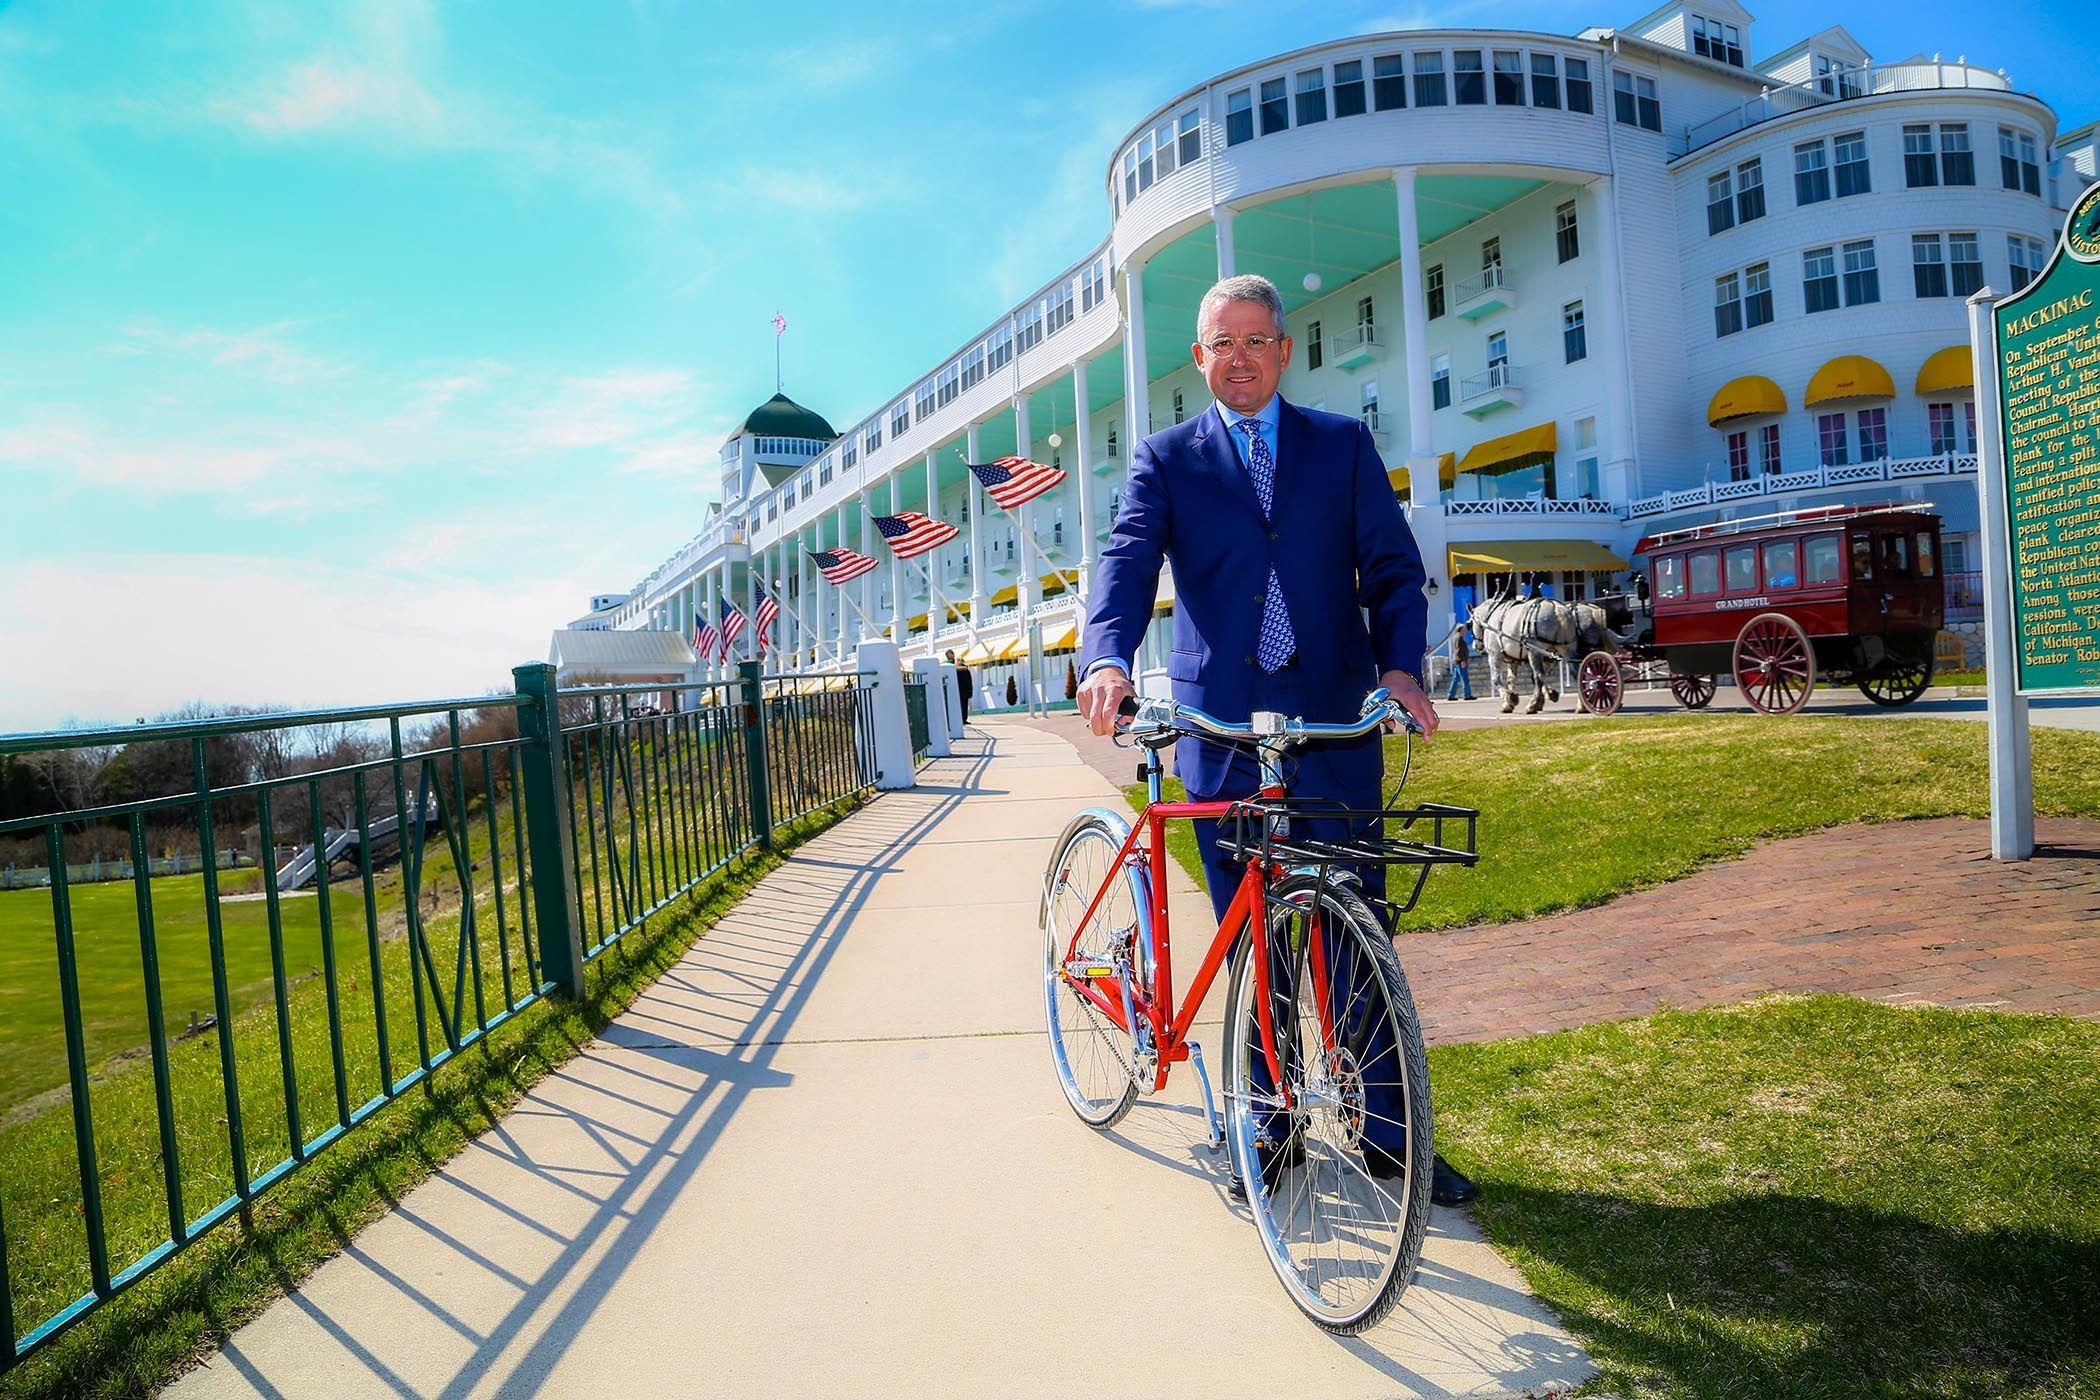 Events Grand Hotel Mackinac Island Grand Hotel Hotel